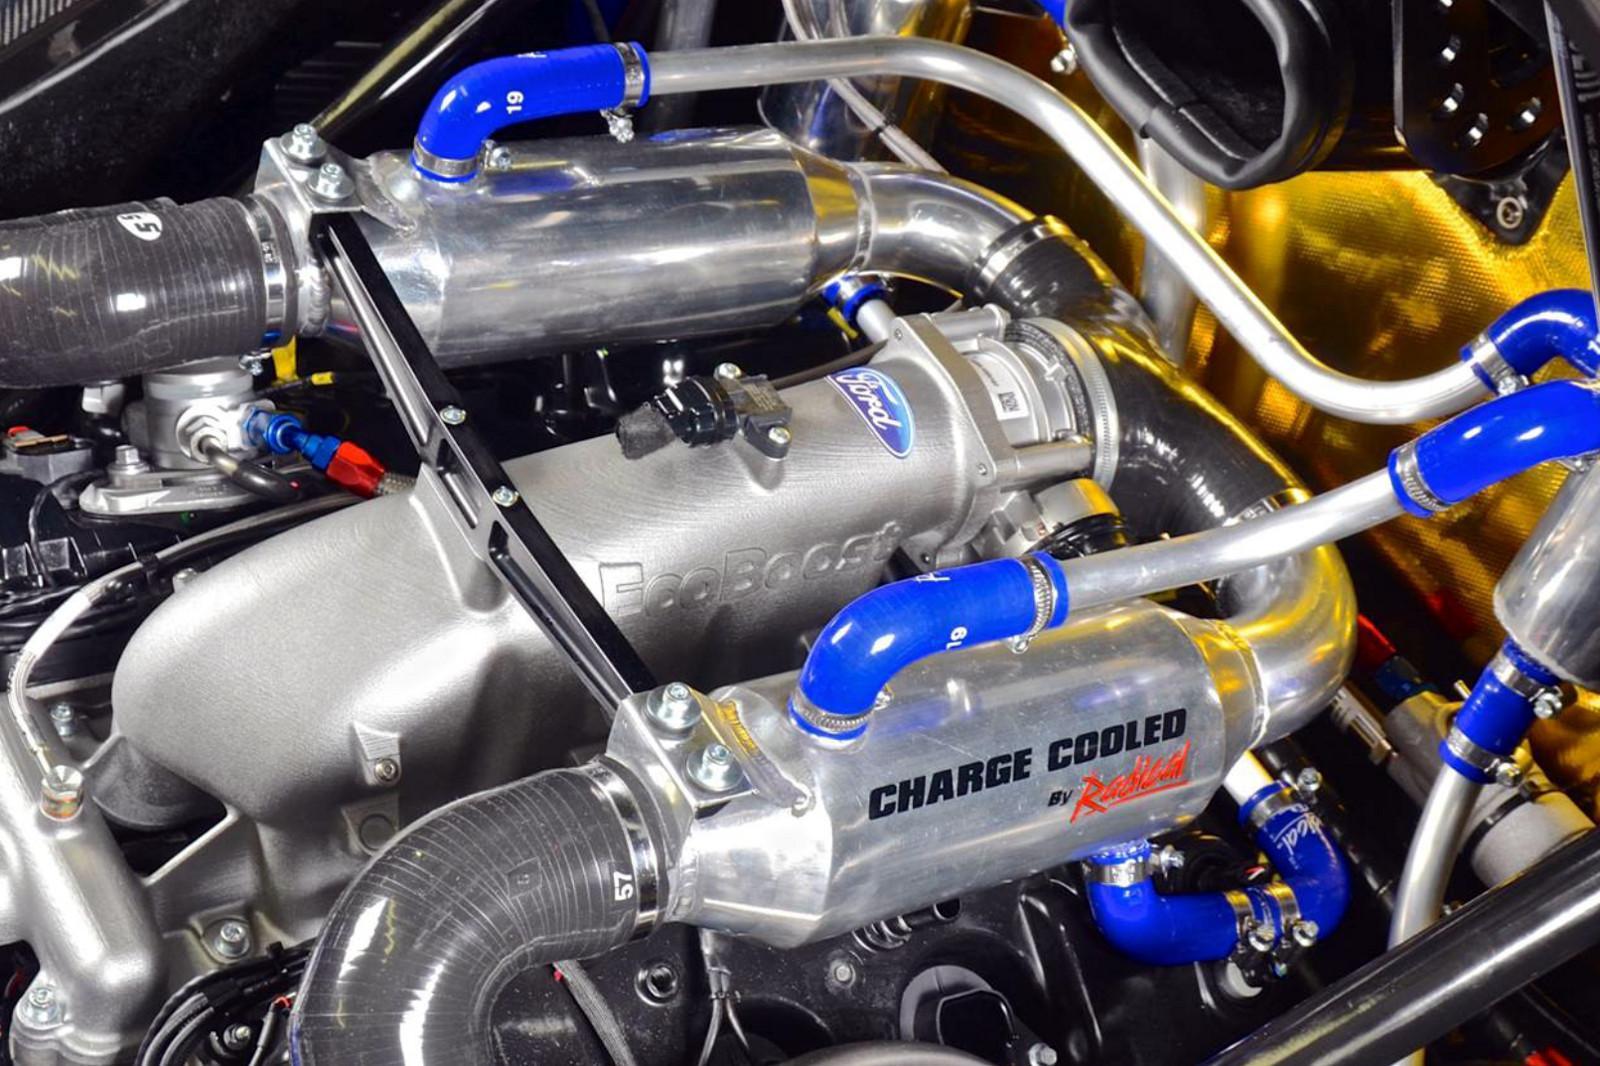 radical-rxc-turbo-500-nurburgring-price-prezzo_0-100_2